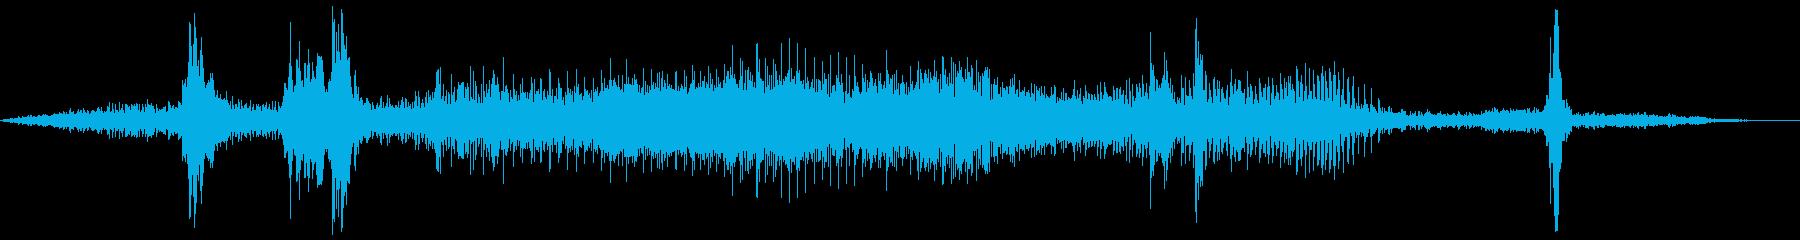 PROPANE:EXT:アプローチ...の再生済みの波形